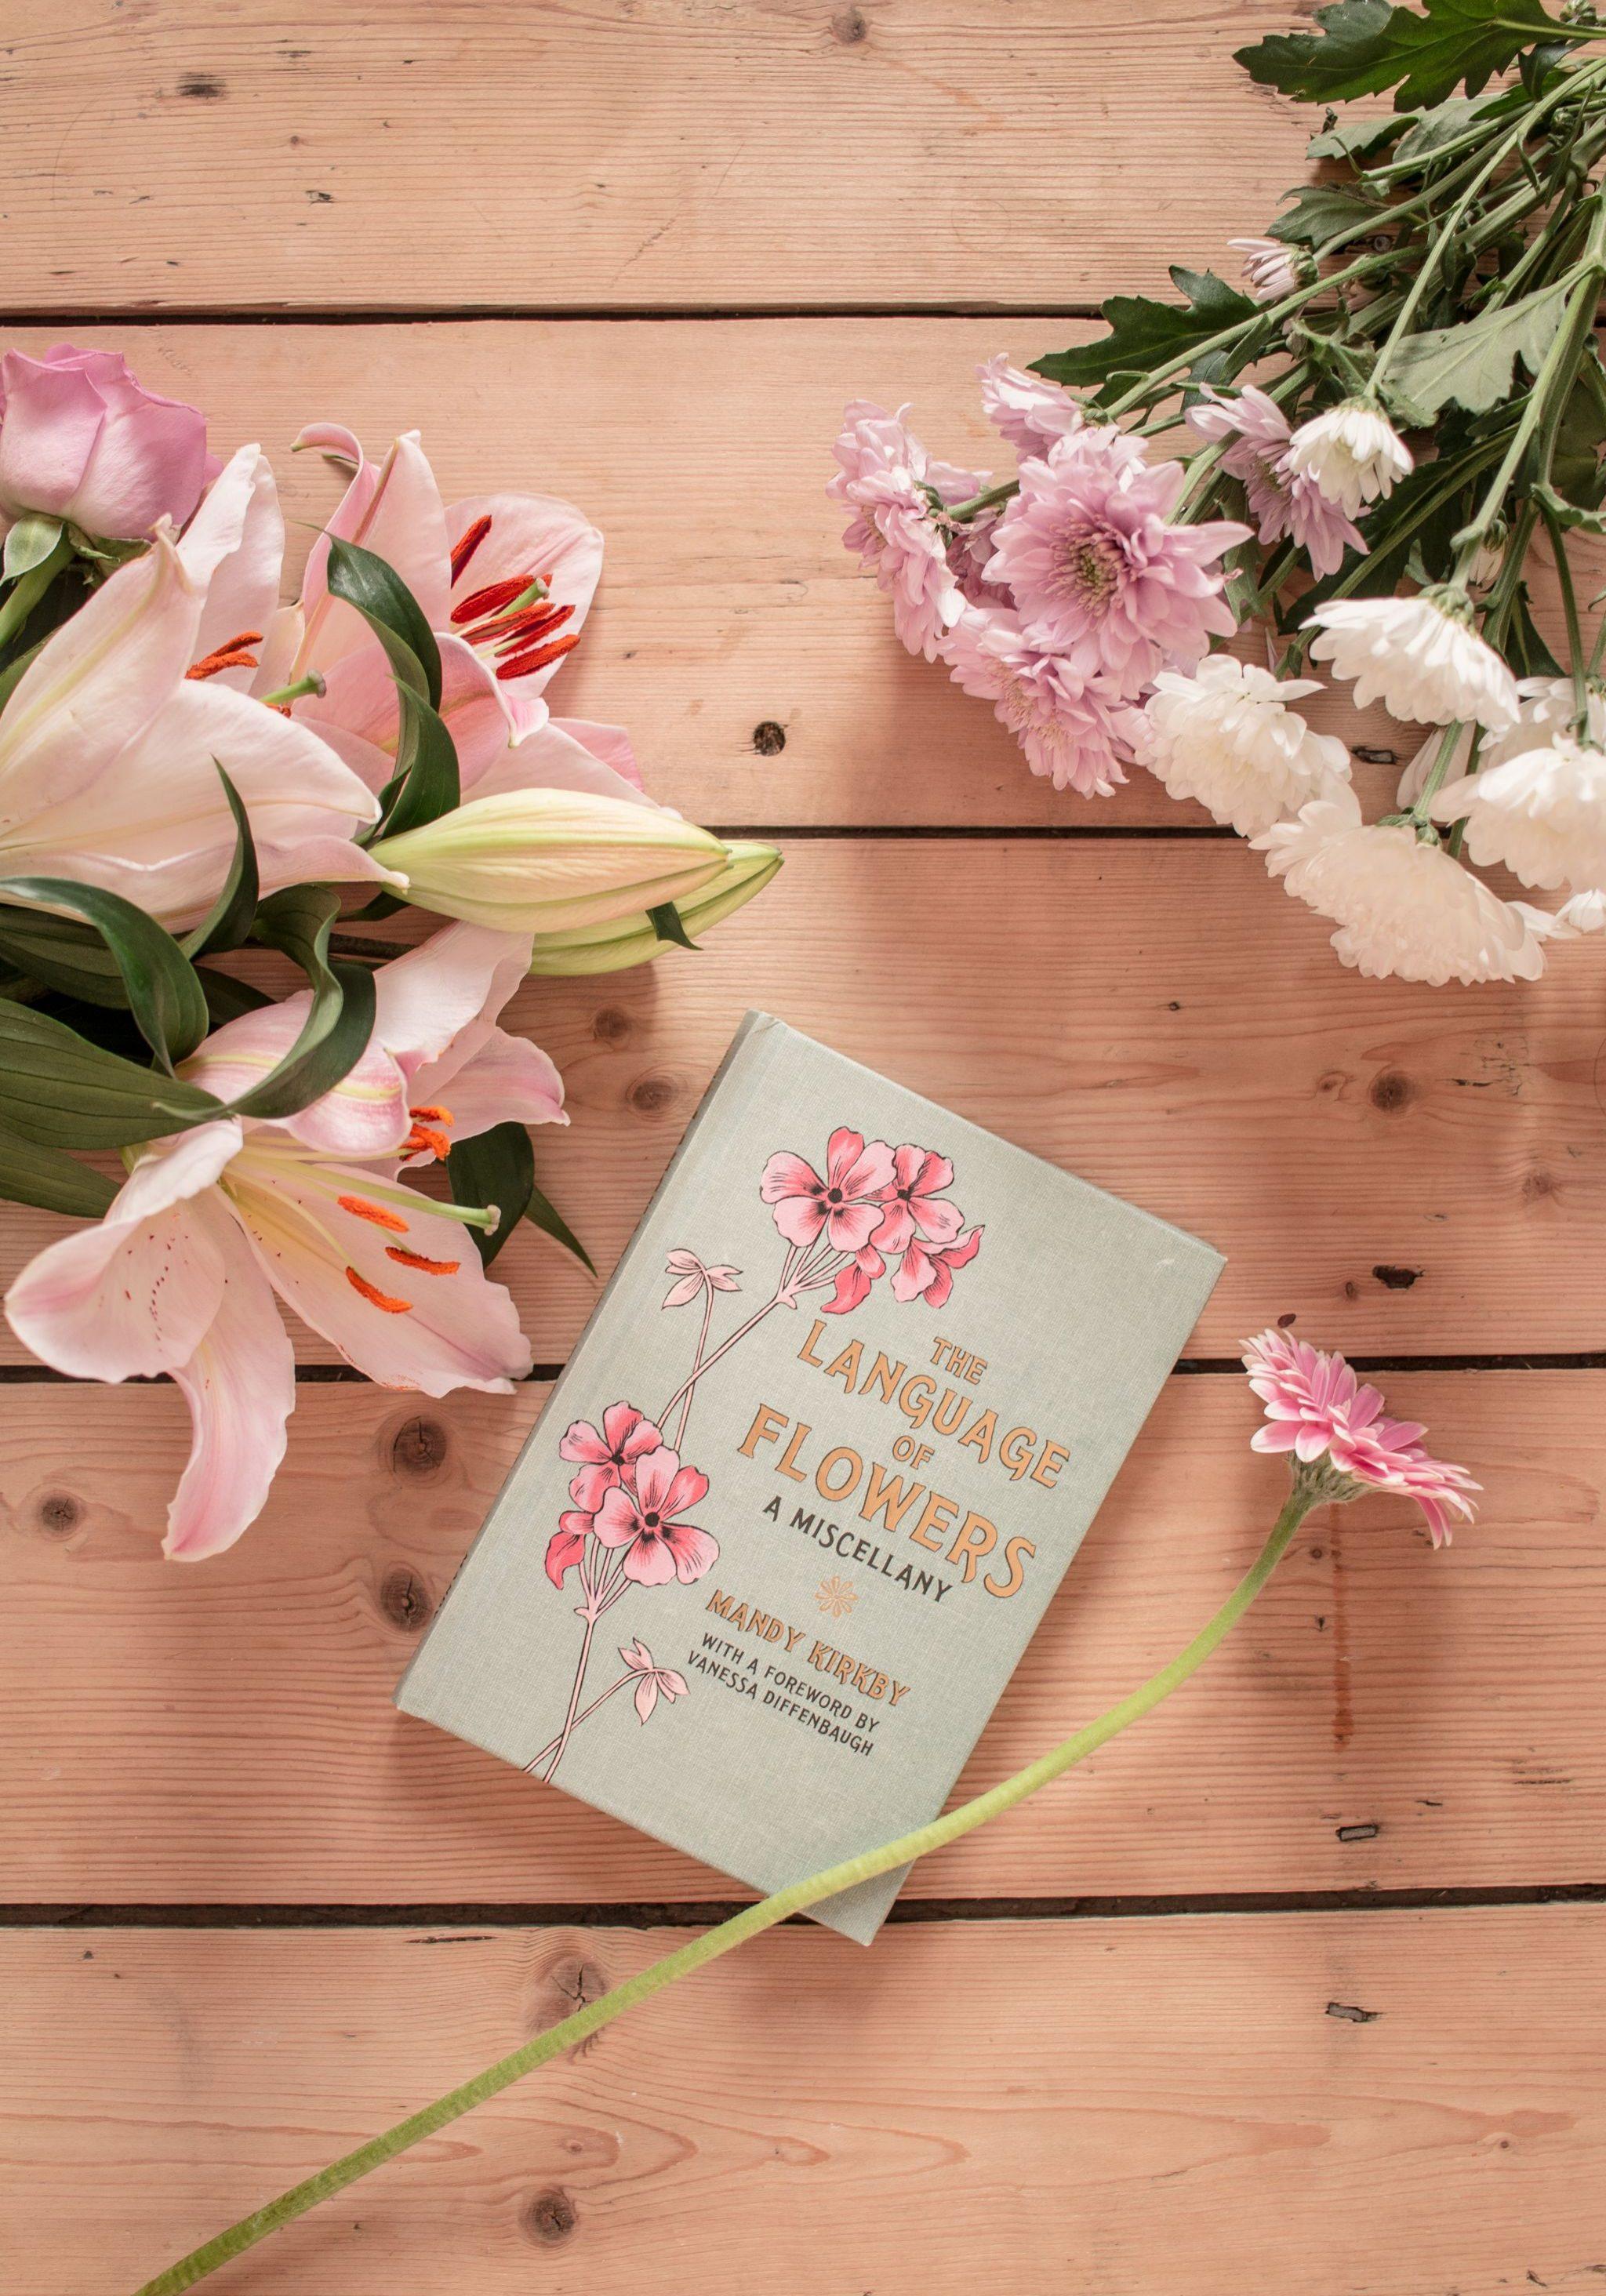 meaning-behind-flowers-header